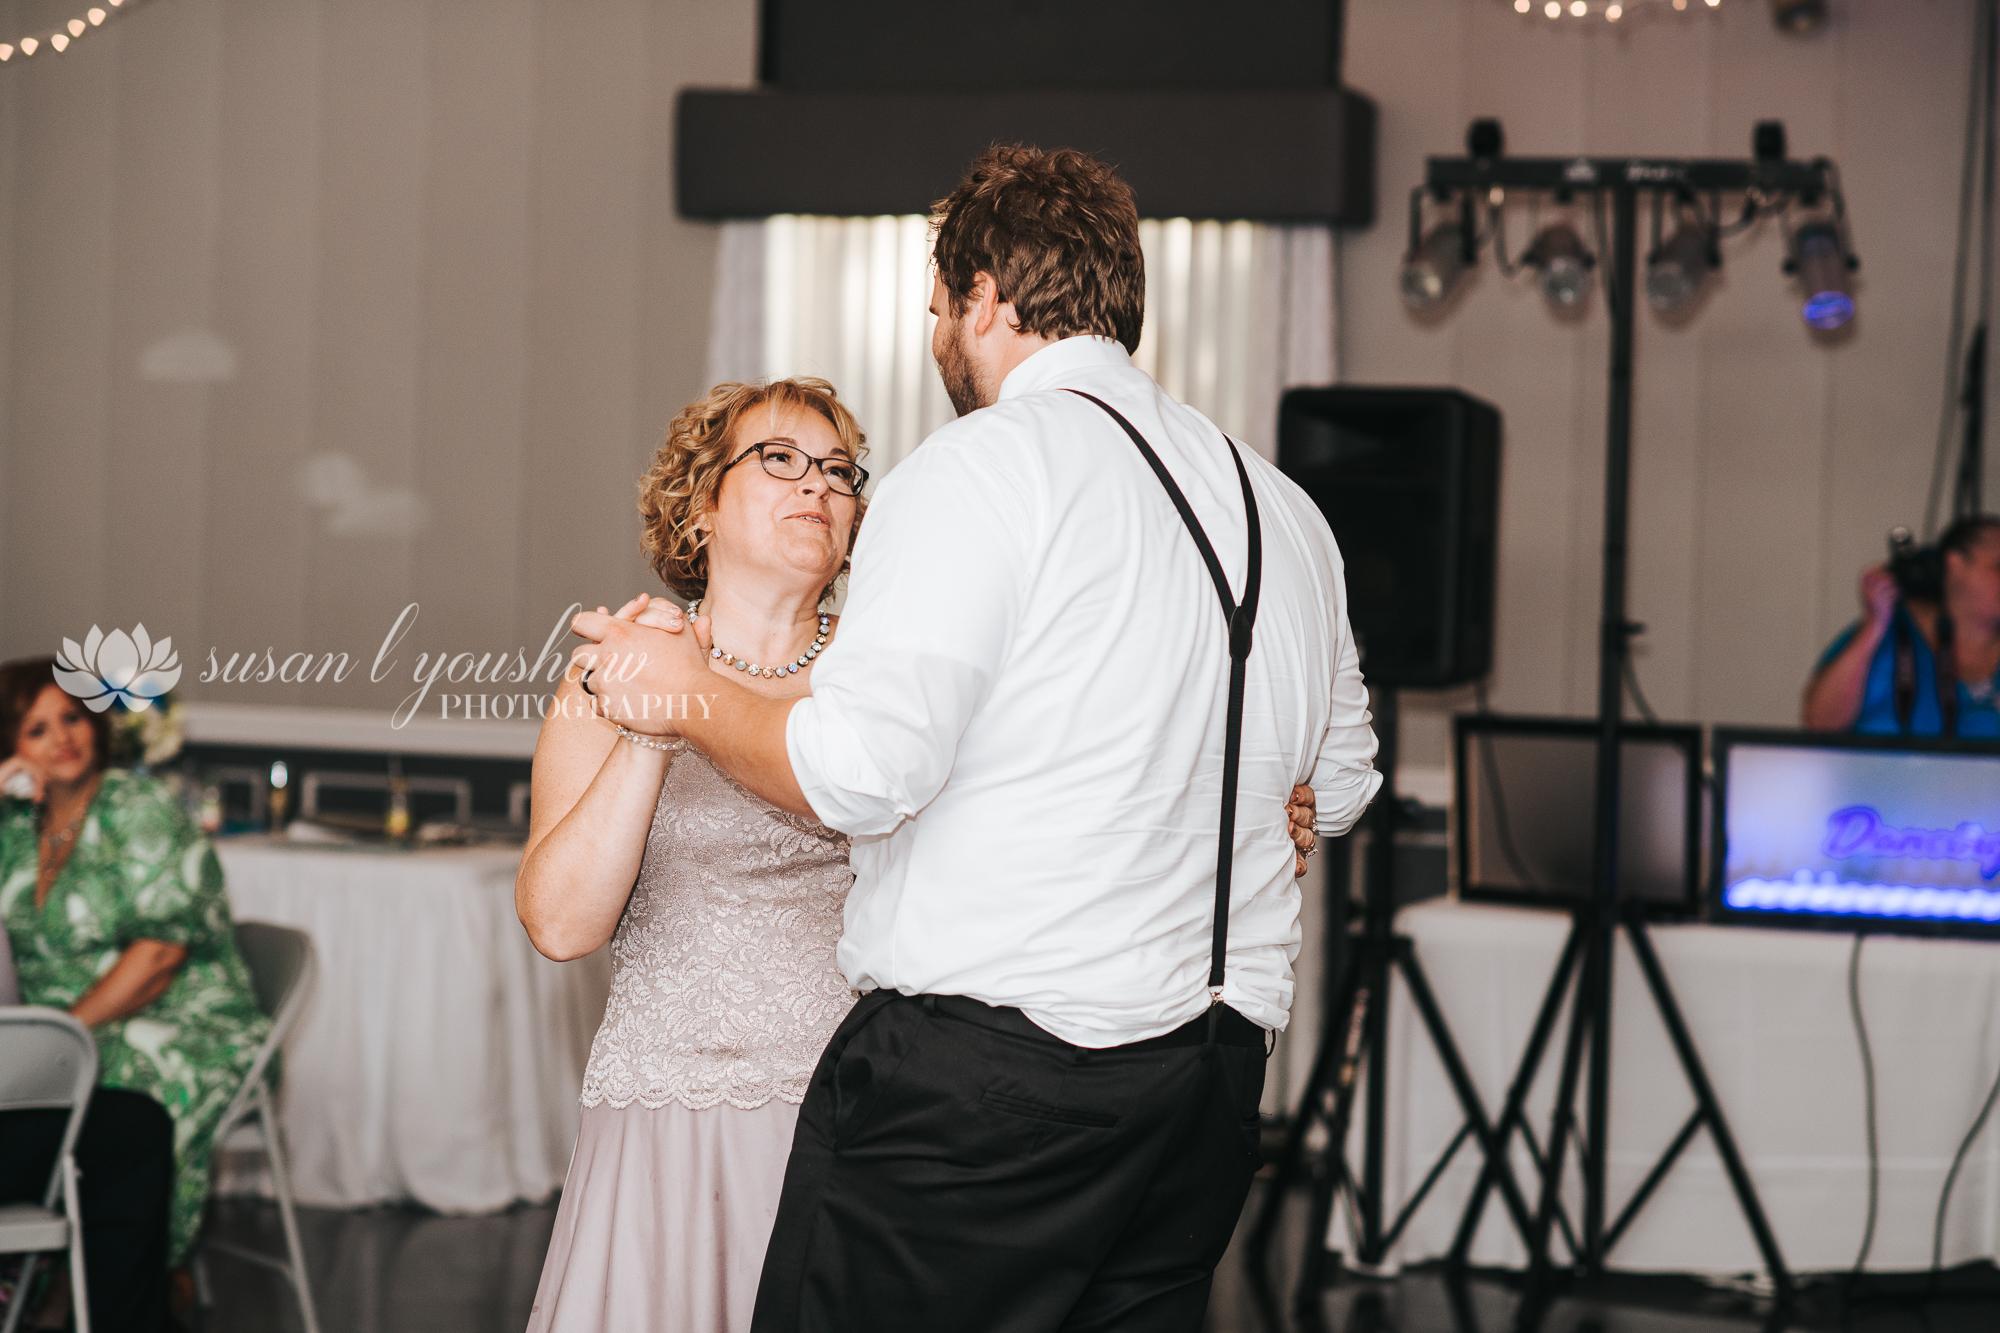 Katelyn and Wes Wedding Photos 07-13-2019 SLY Photography-118.jpg